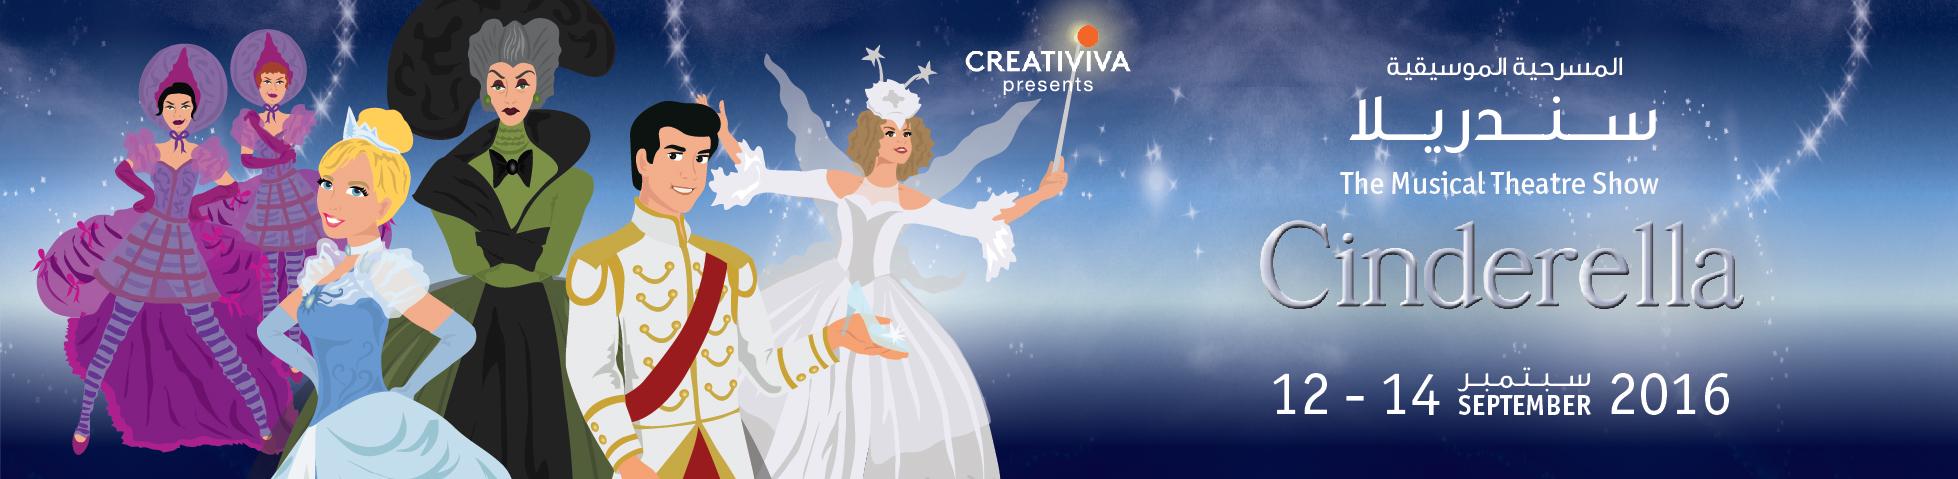 The Musical Theatre Show Cinderella